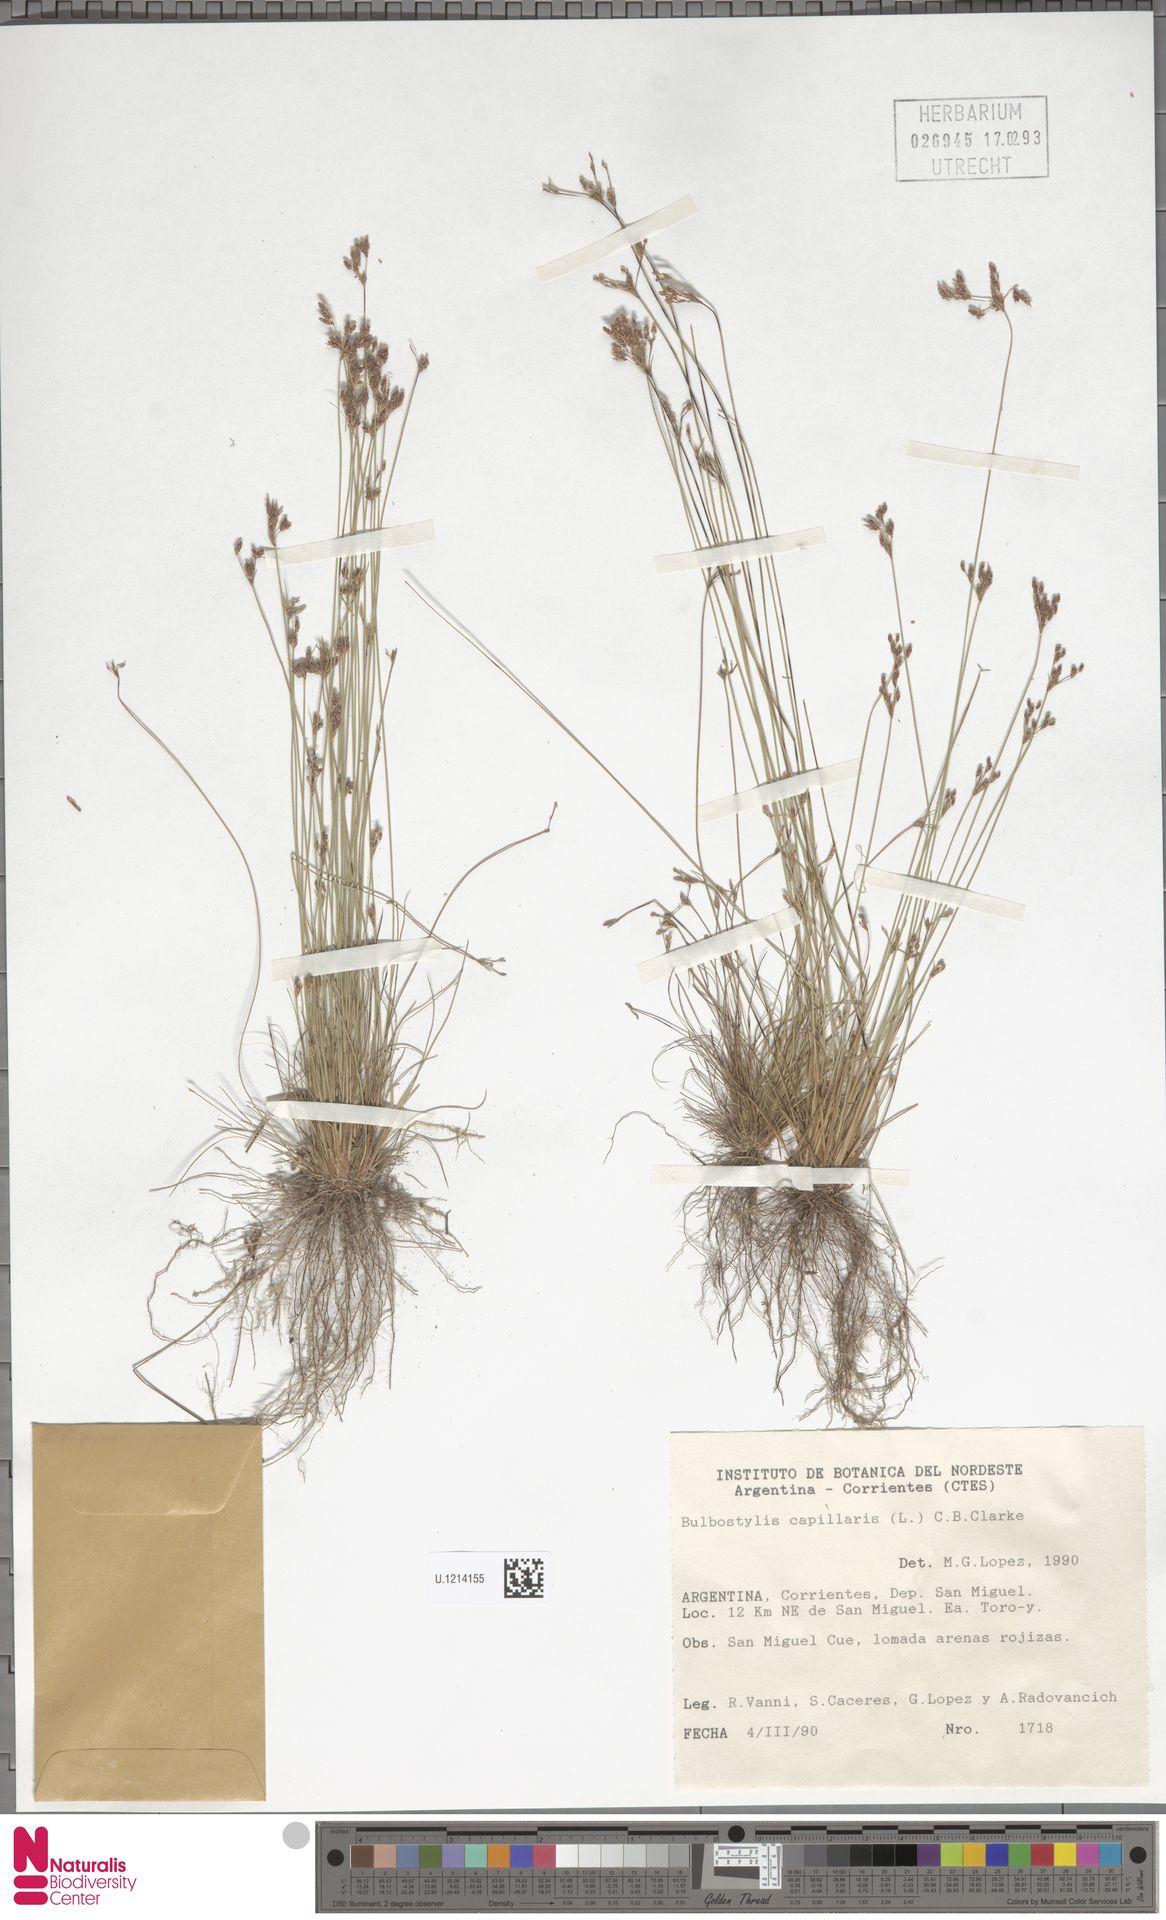 U.1214155 | Bulbostylis capillaris (L.) Kunth ex C.B.Clarke